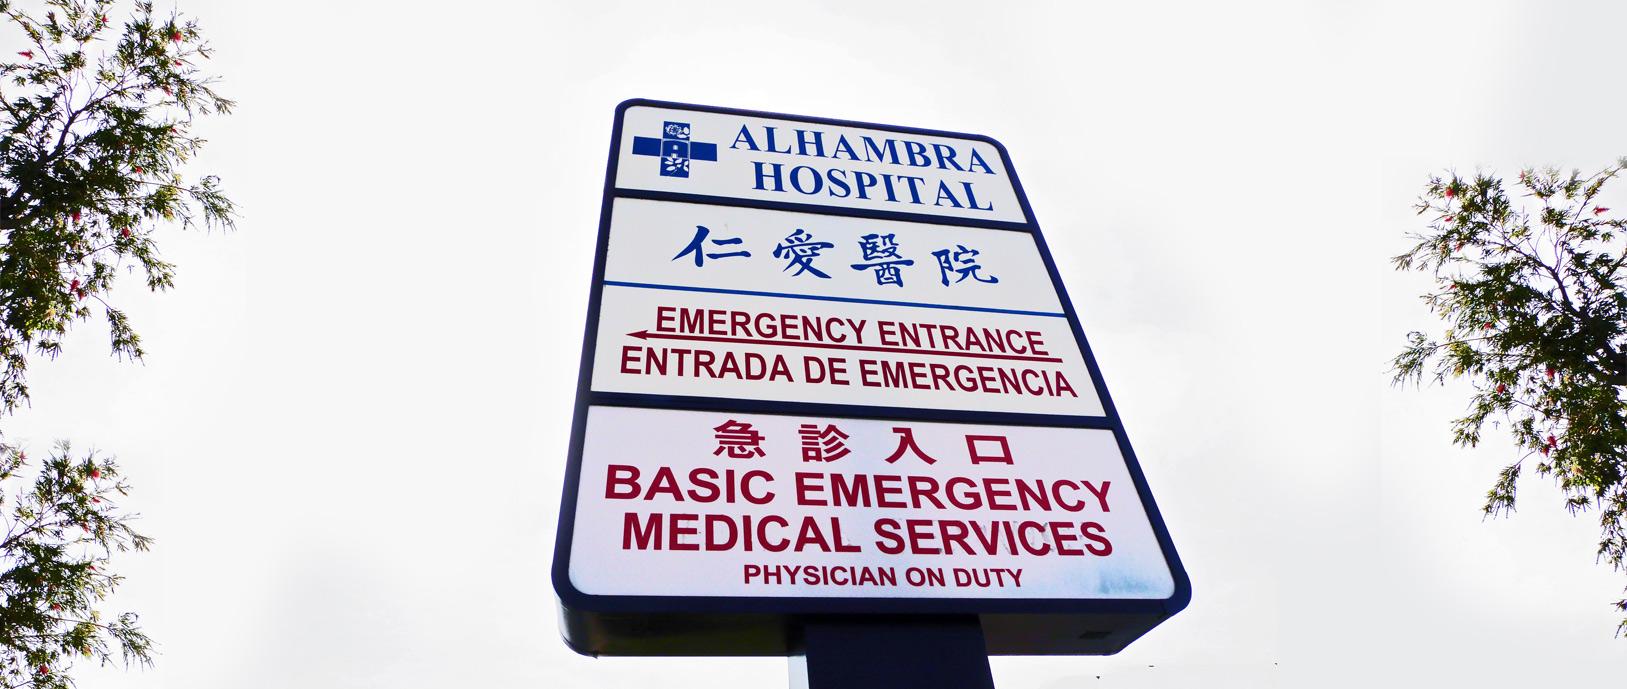 Alhambra Hospital Sign